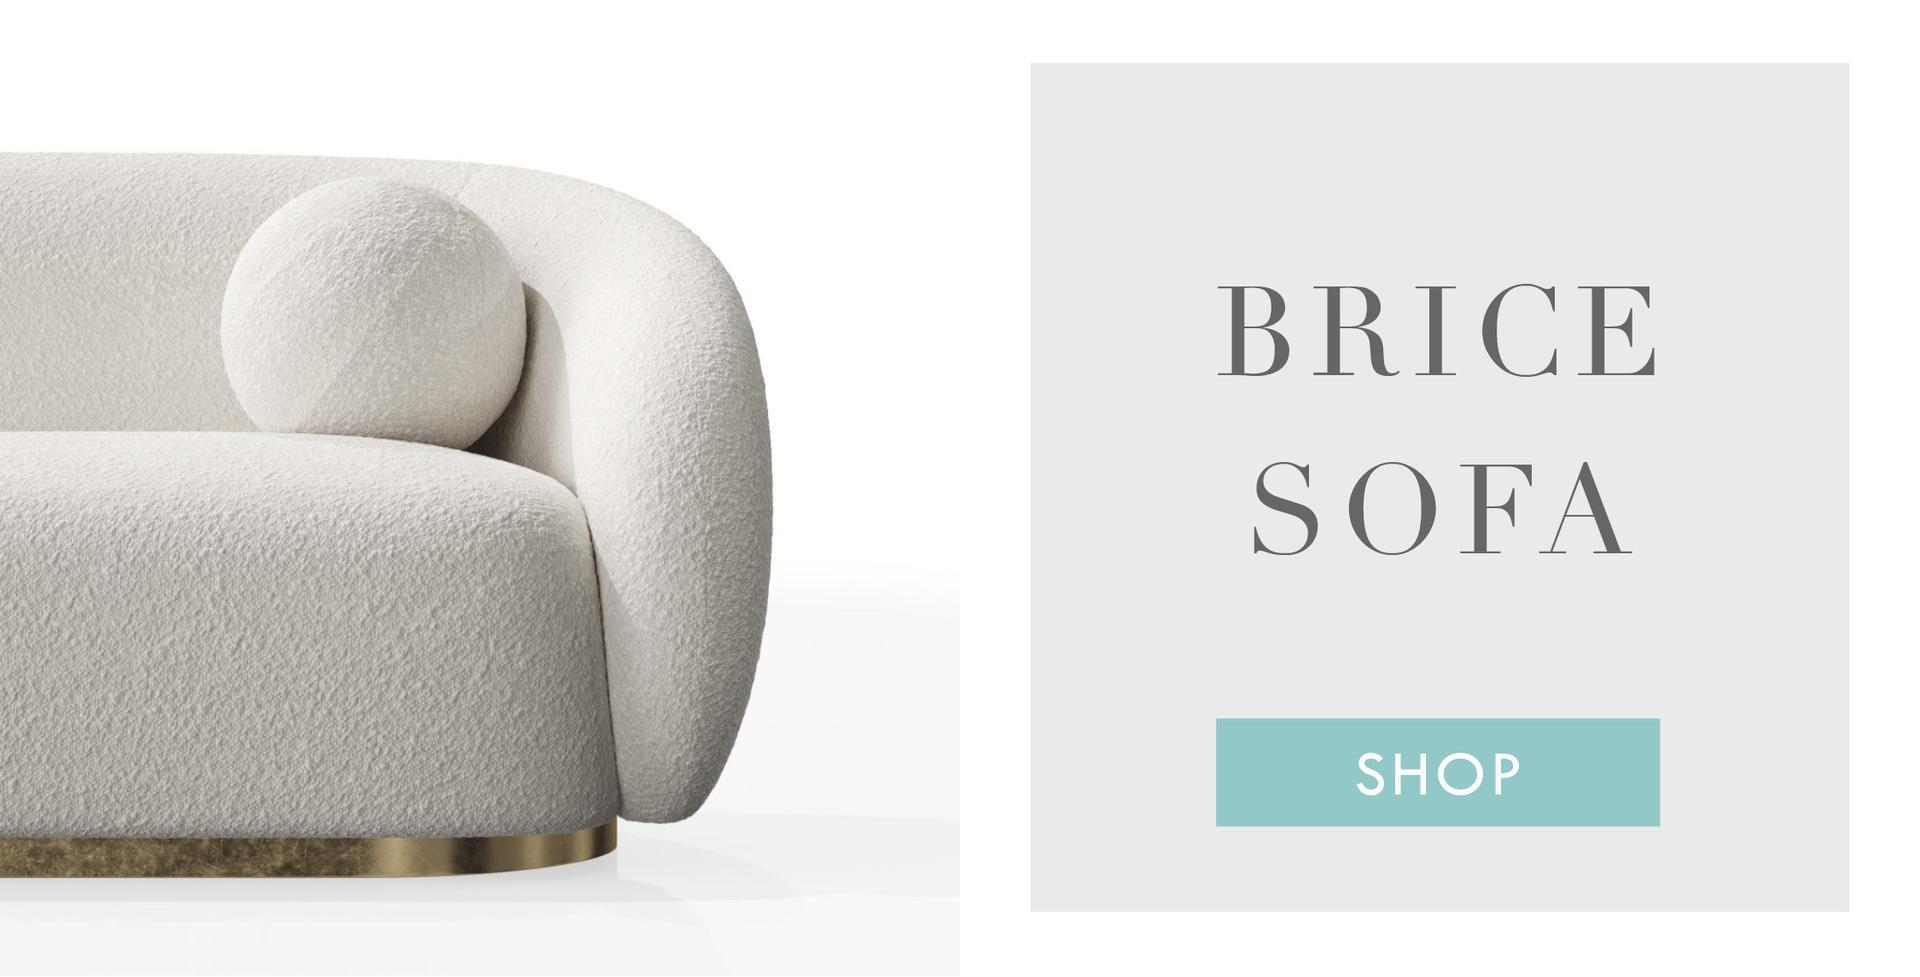 Shop the Brice Sofa